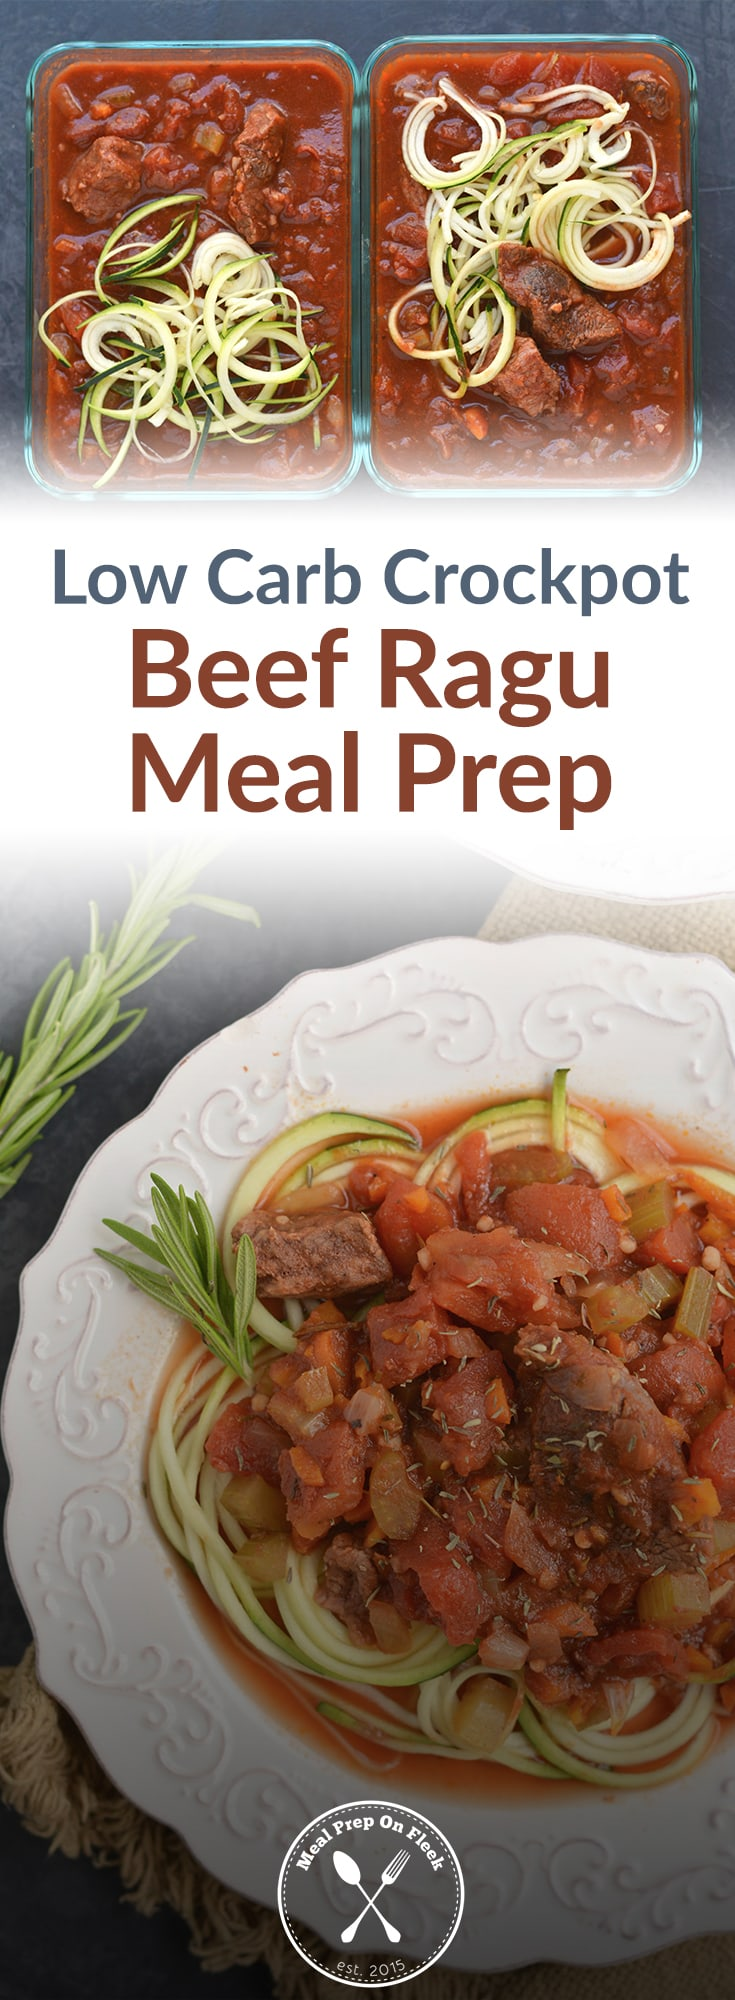 Low Carb Crockpot Beef Ragu Meal Prep